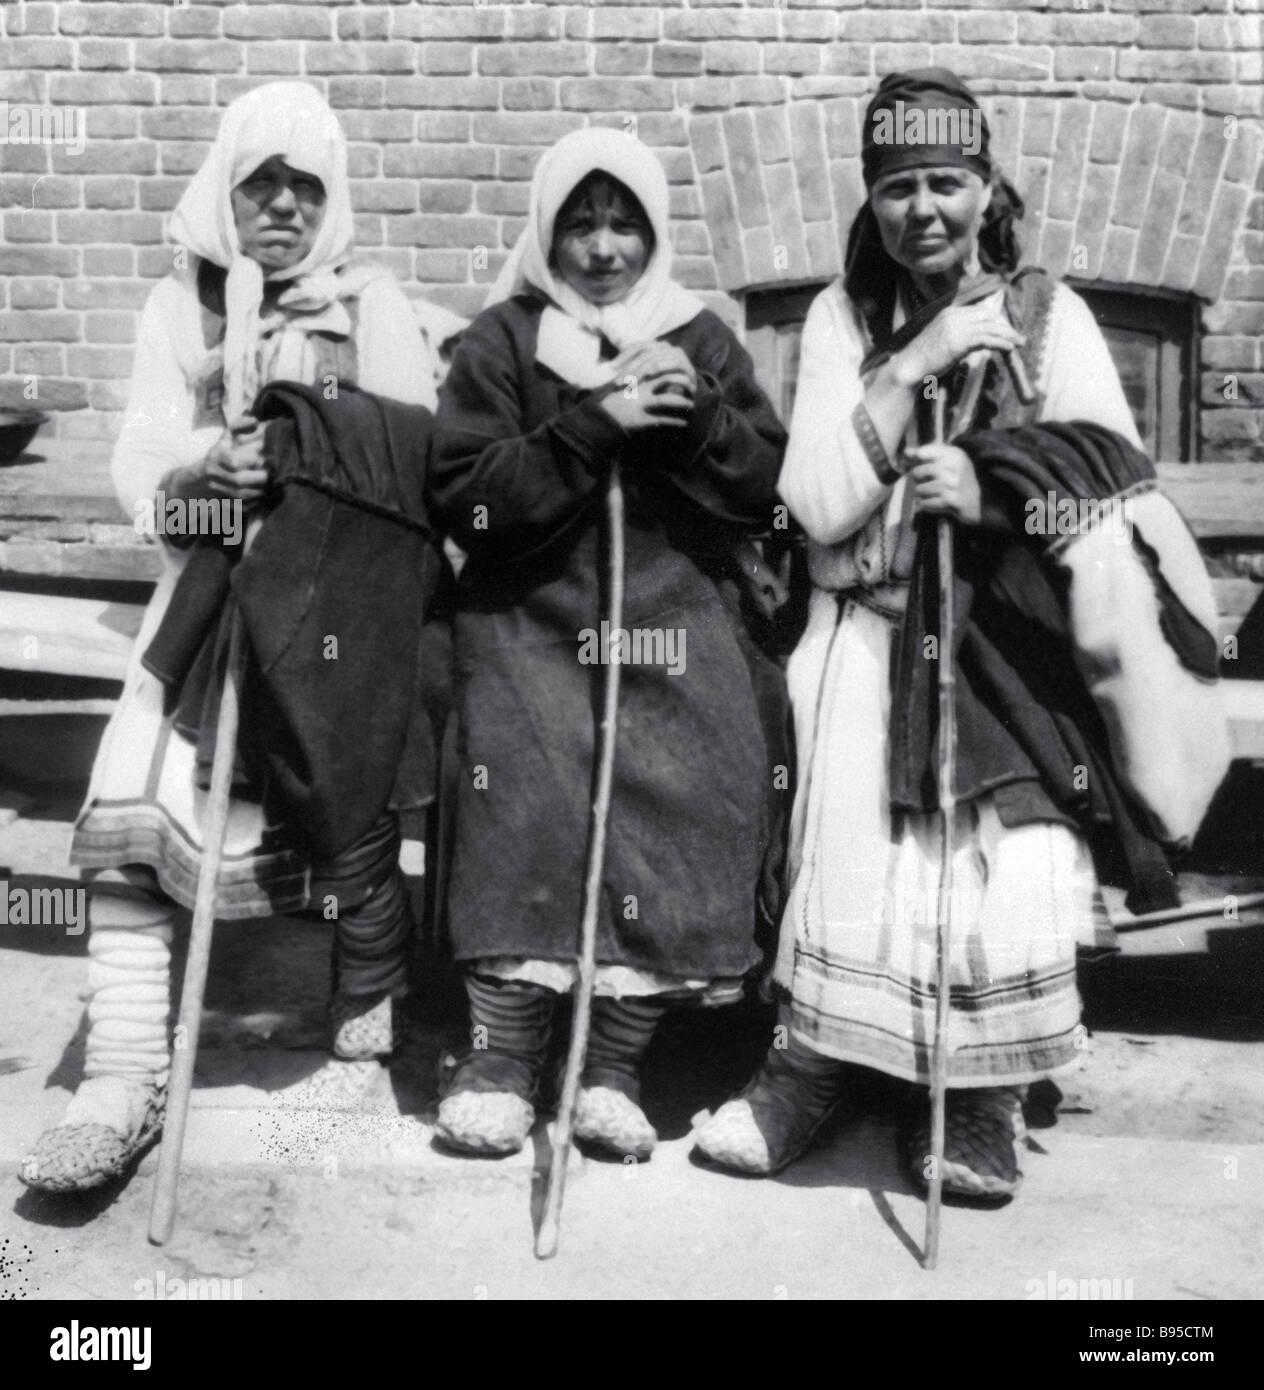 Women pilgrims at the walls of the Ponetayevsky Monastery - Stock Image